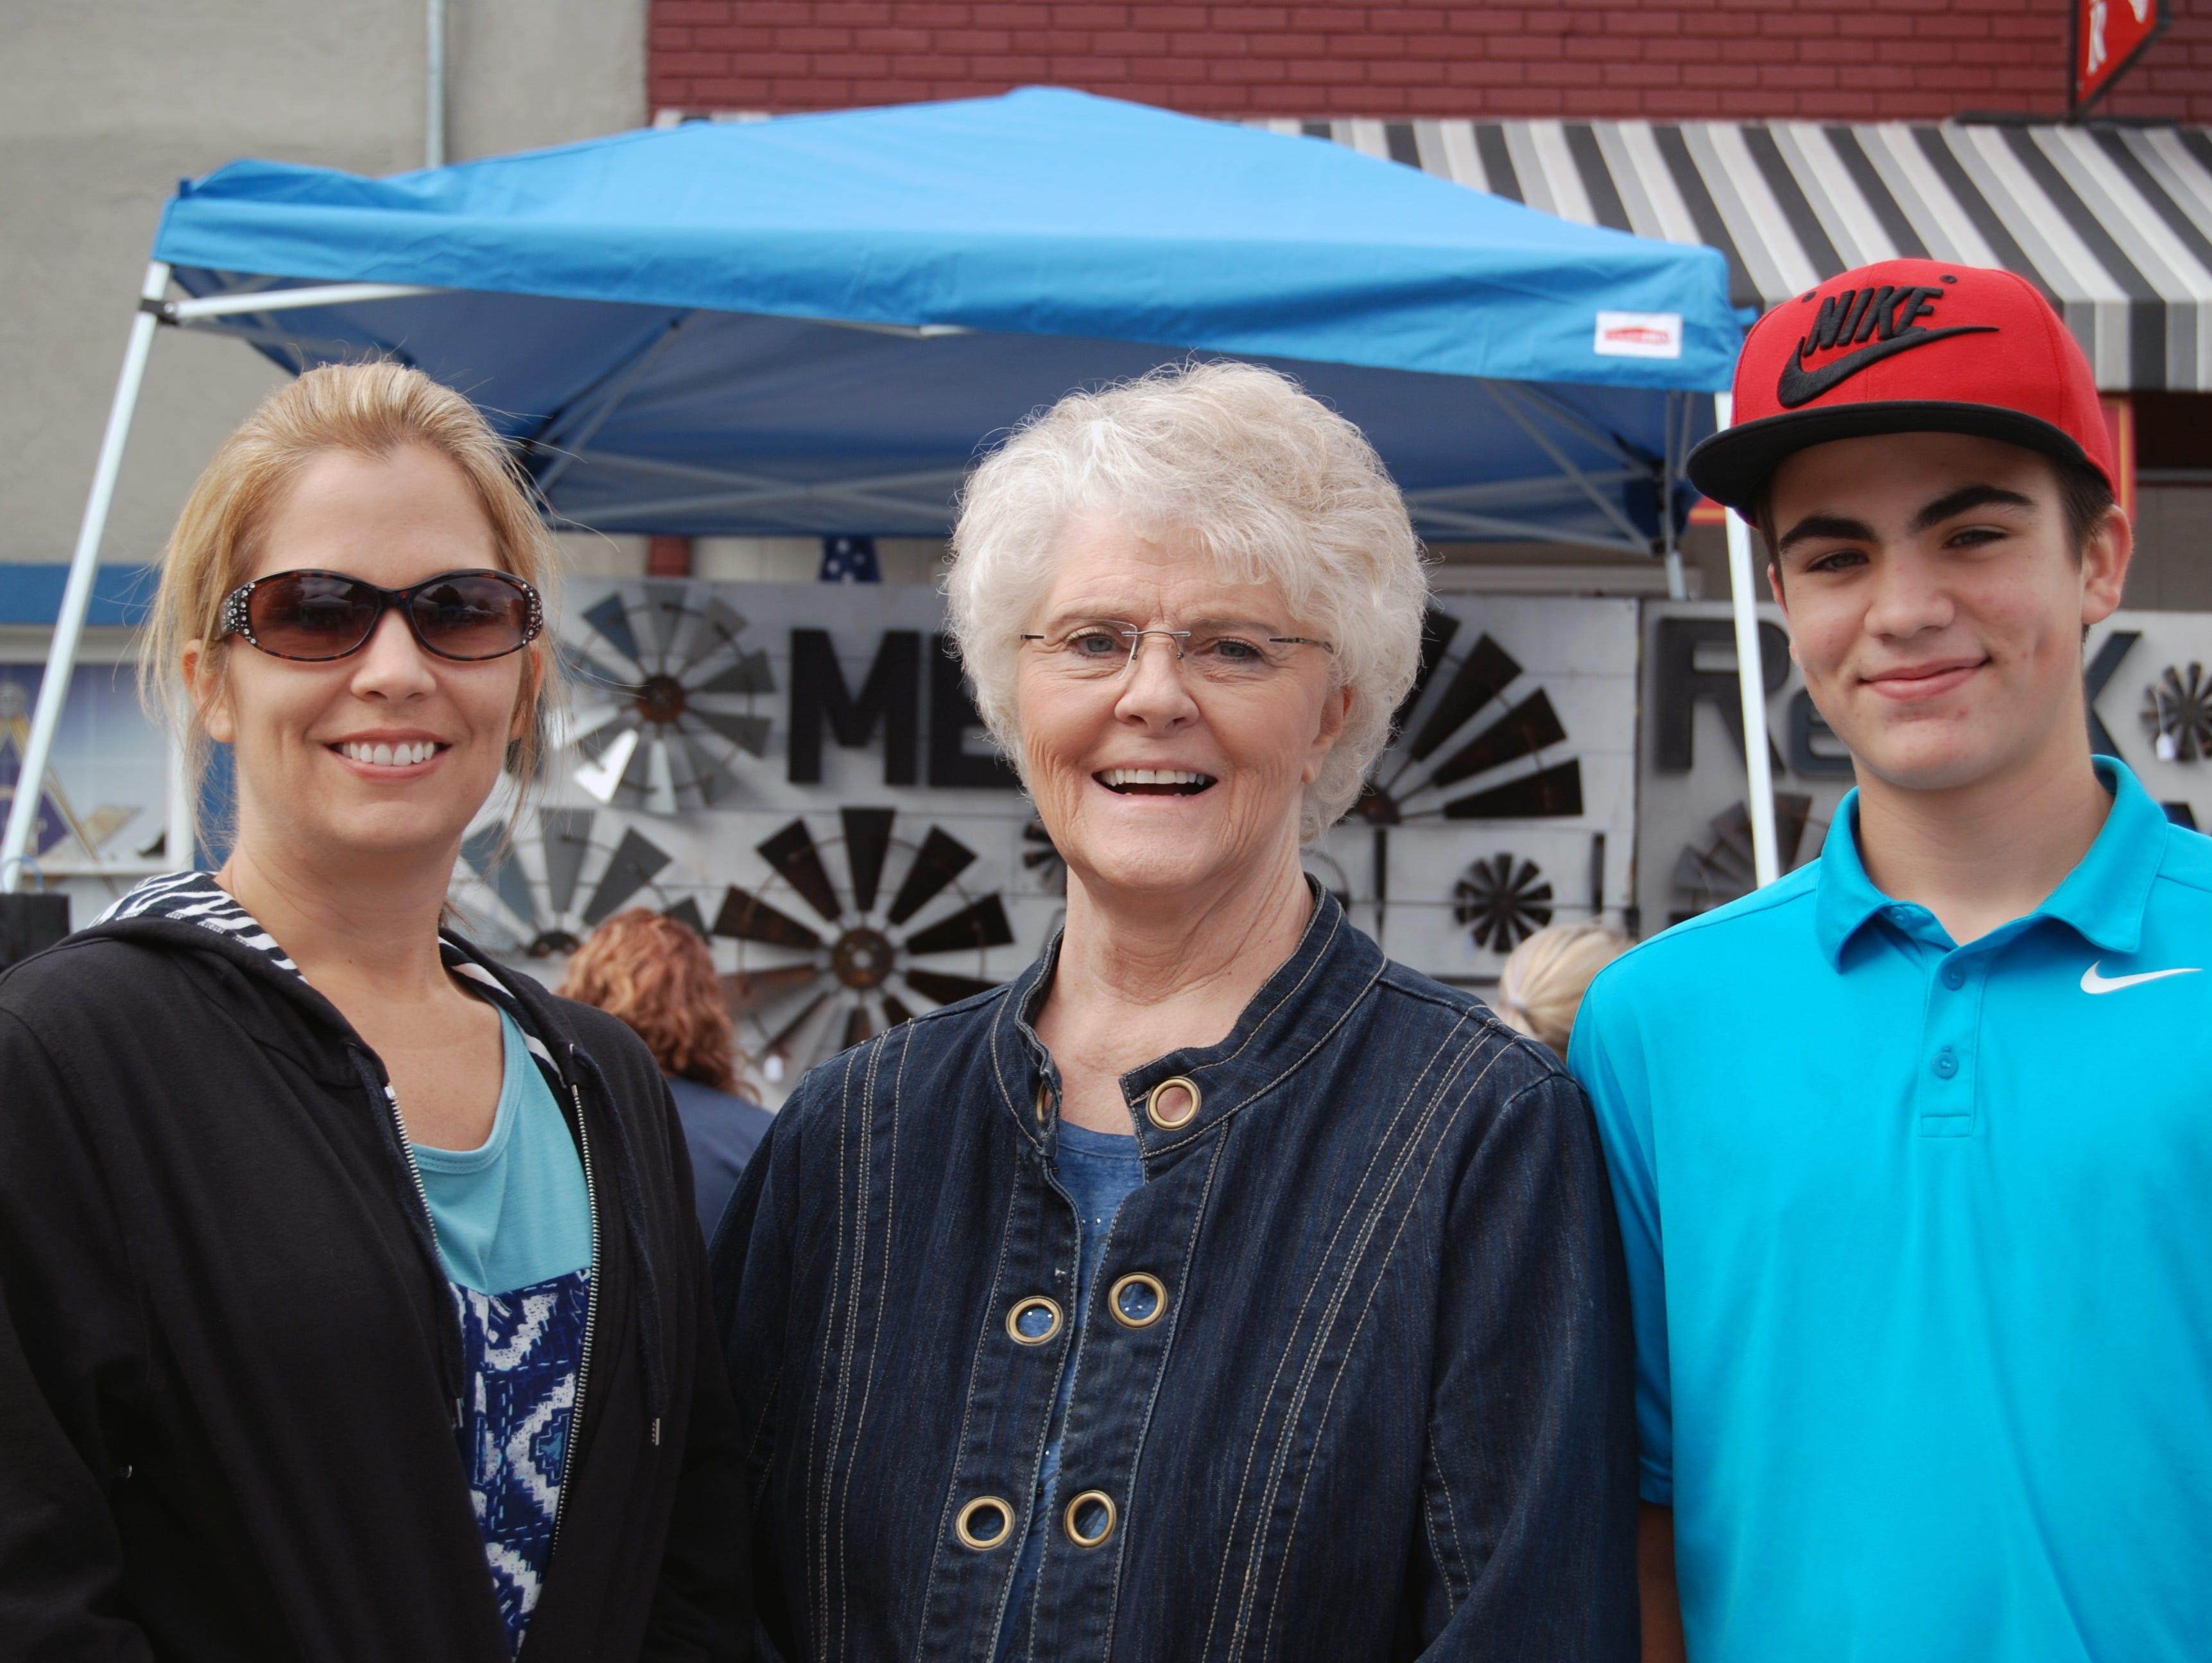 Marianne Hill, Linda Nicholls and Jacob Hill